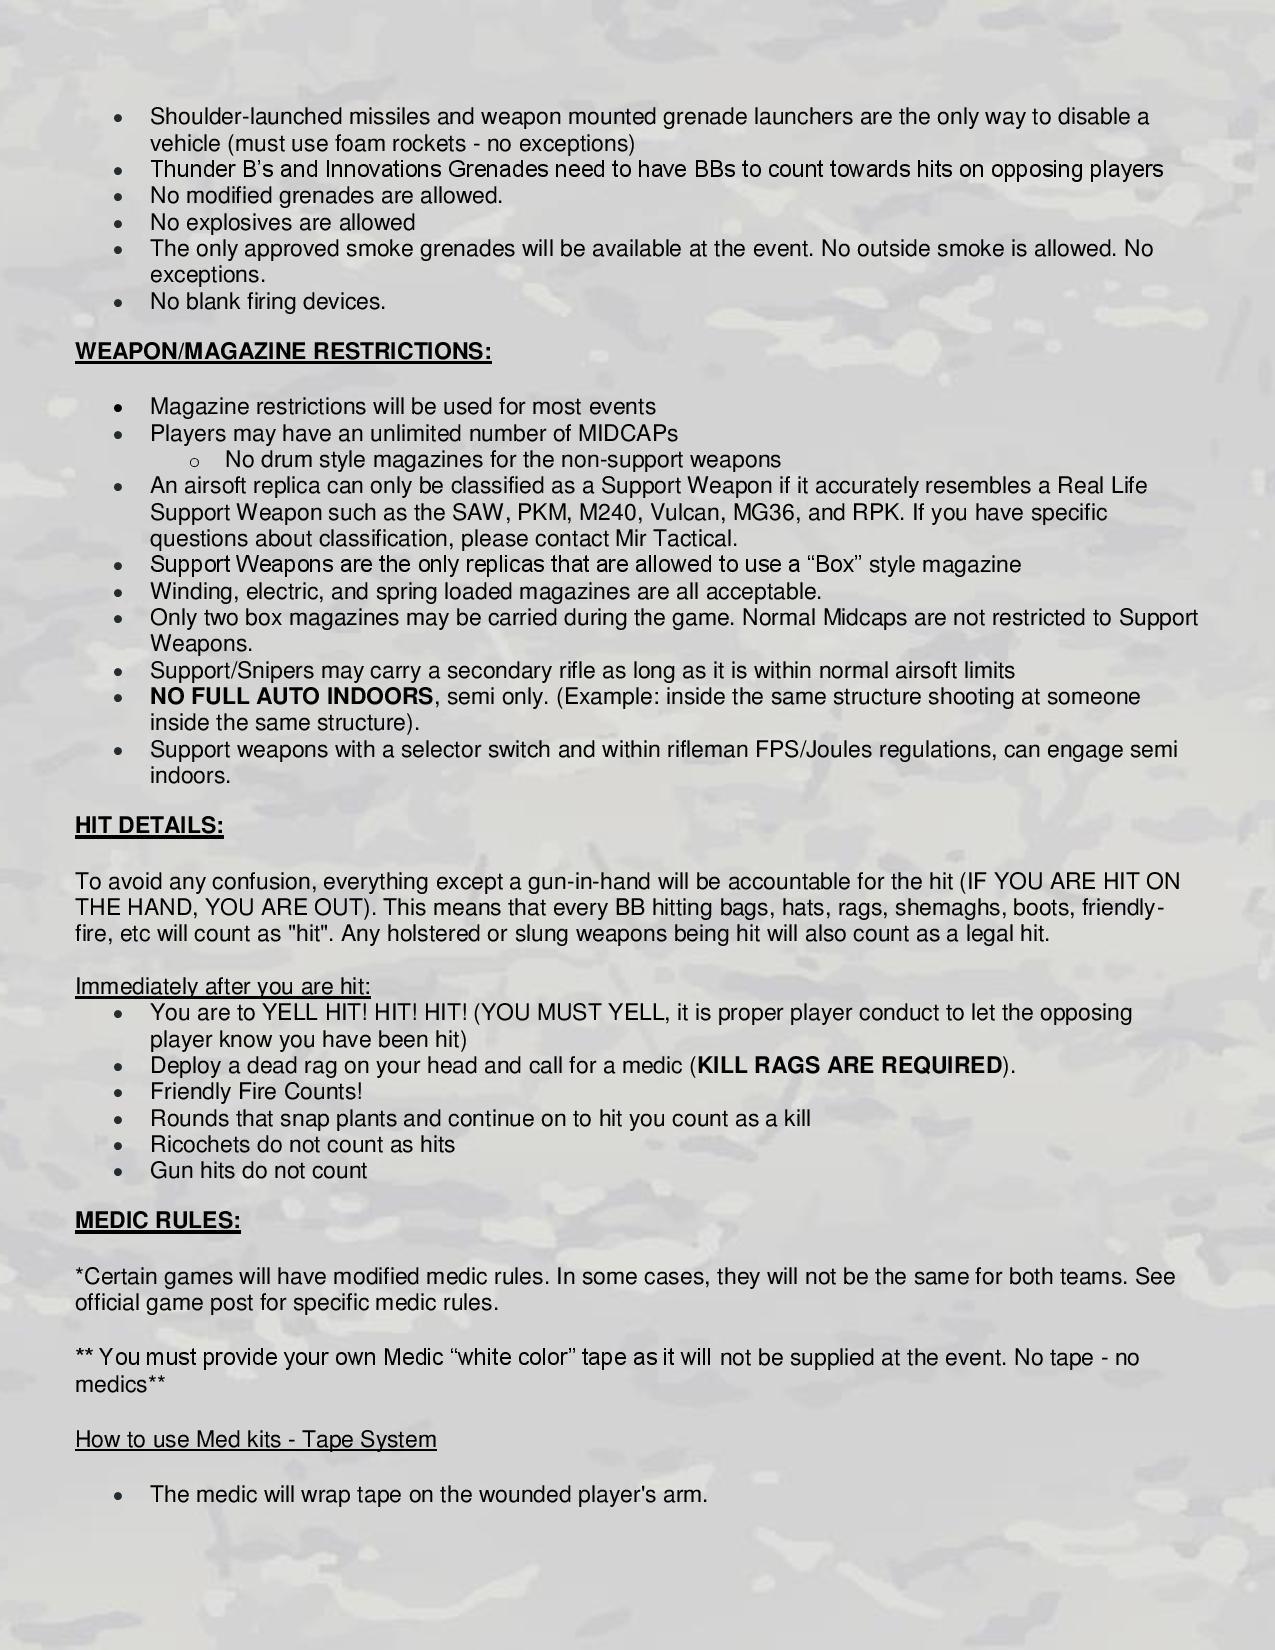 mir-tactical-strikeball-airsoft-sop-v1.1-page-003.jpg